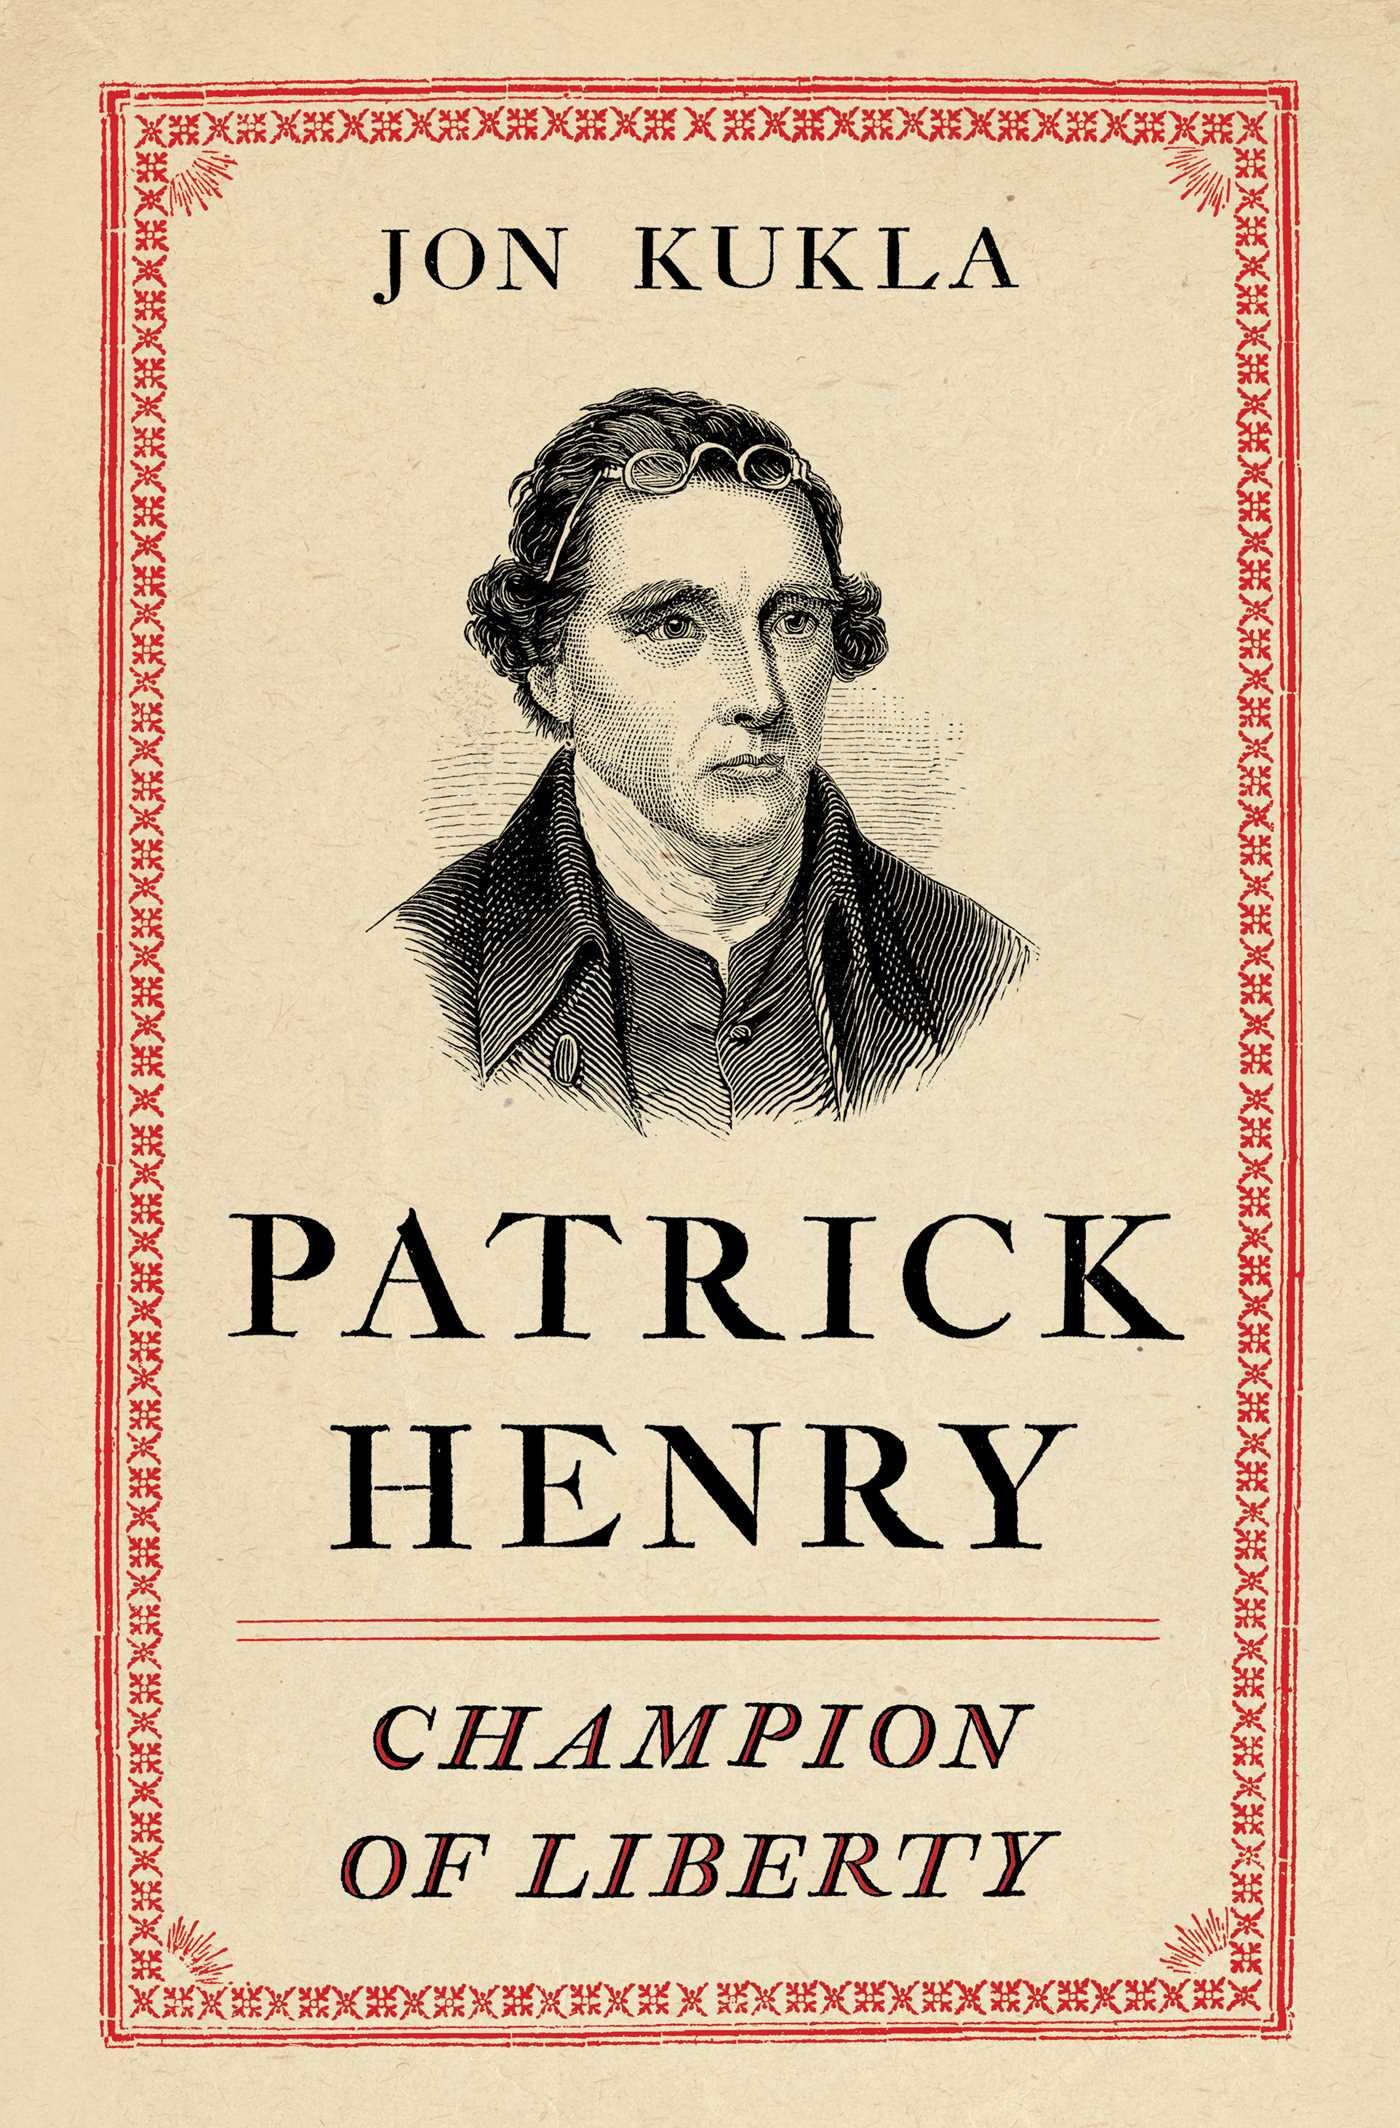 Patrick henry 9781439190814 hr